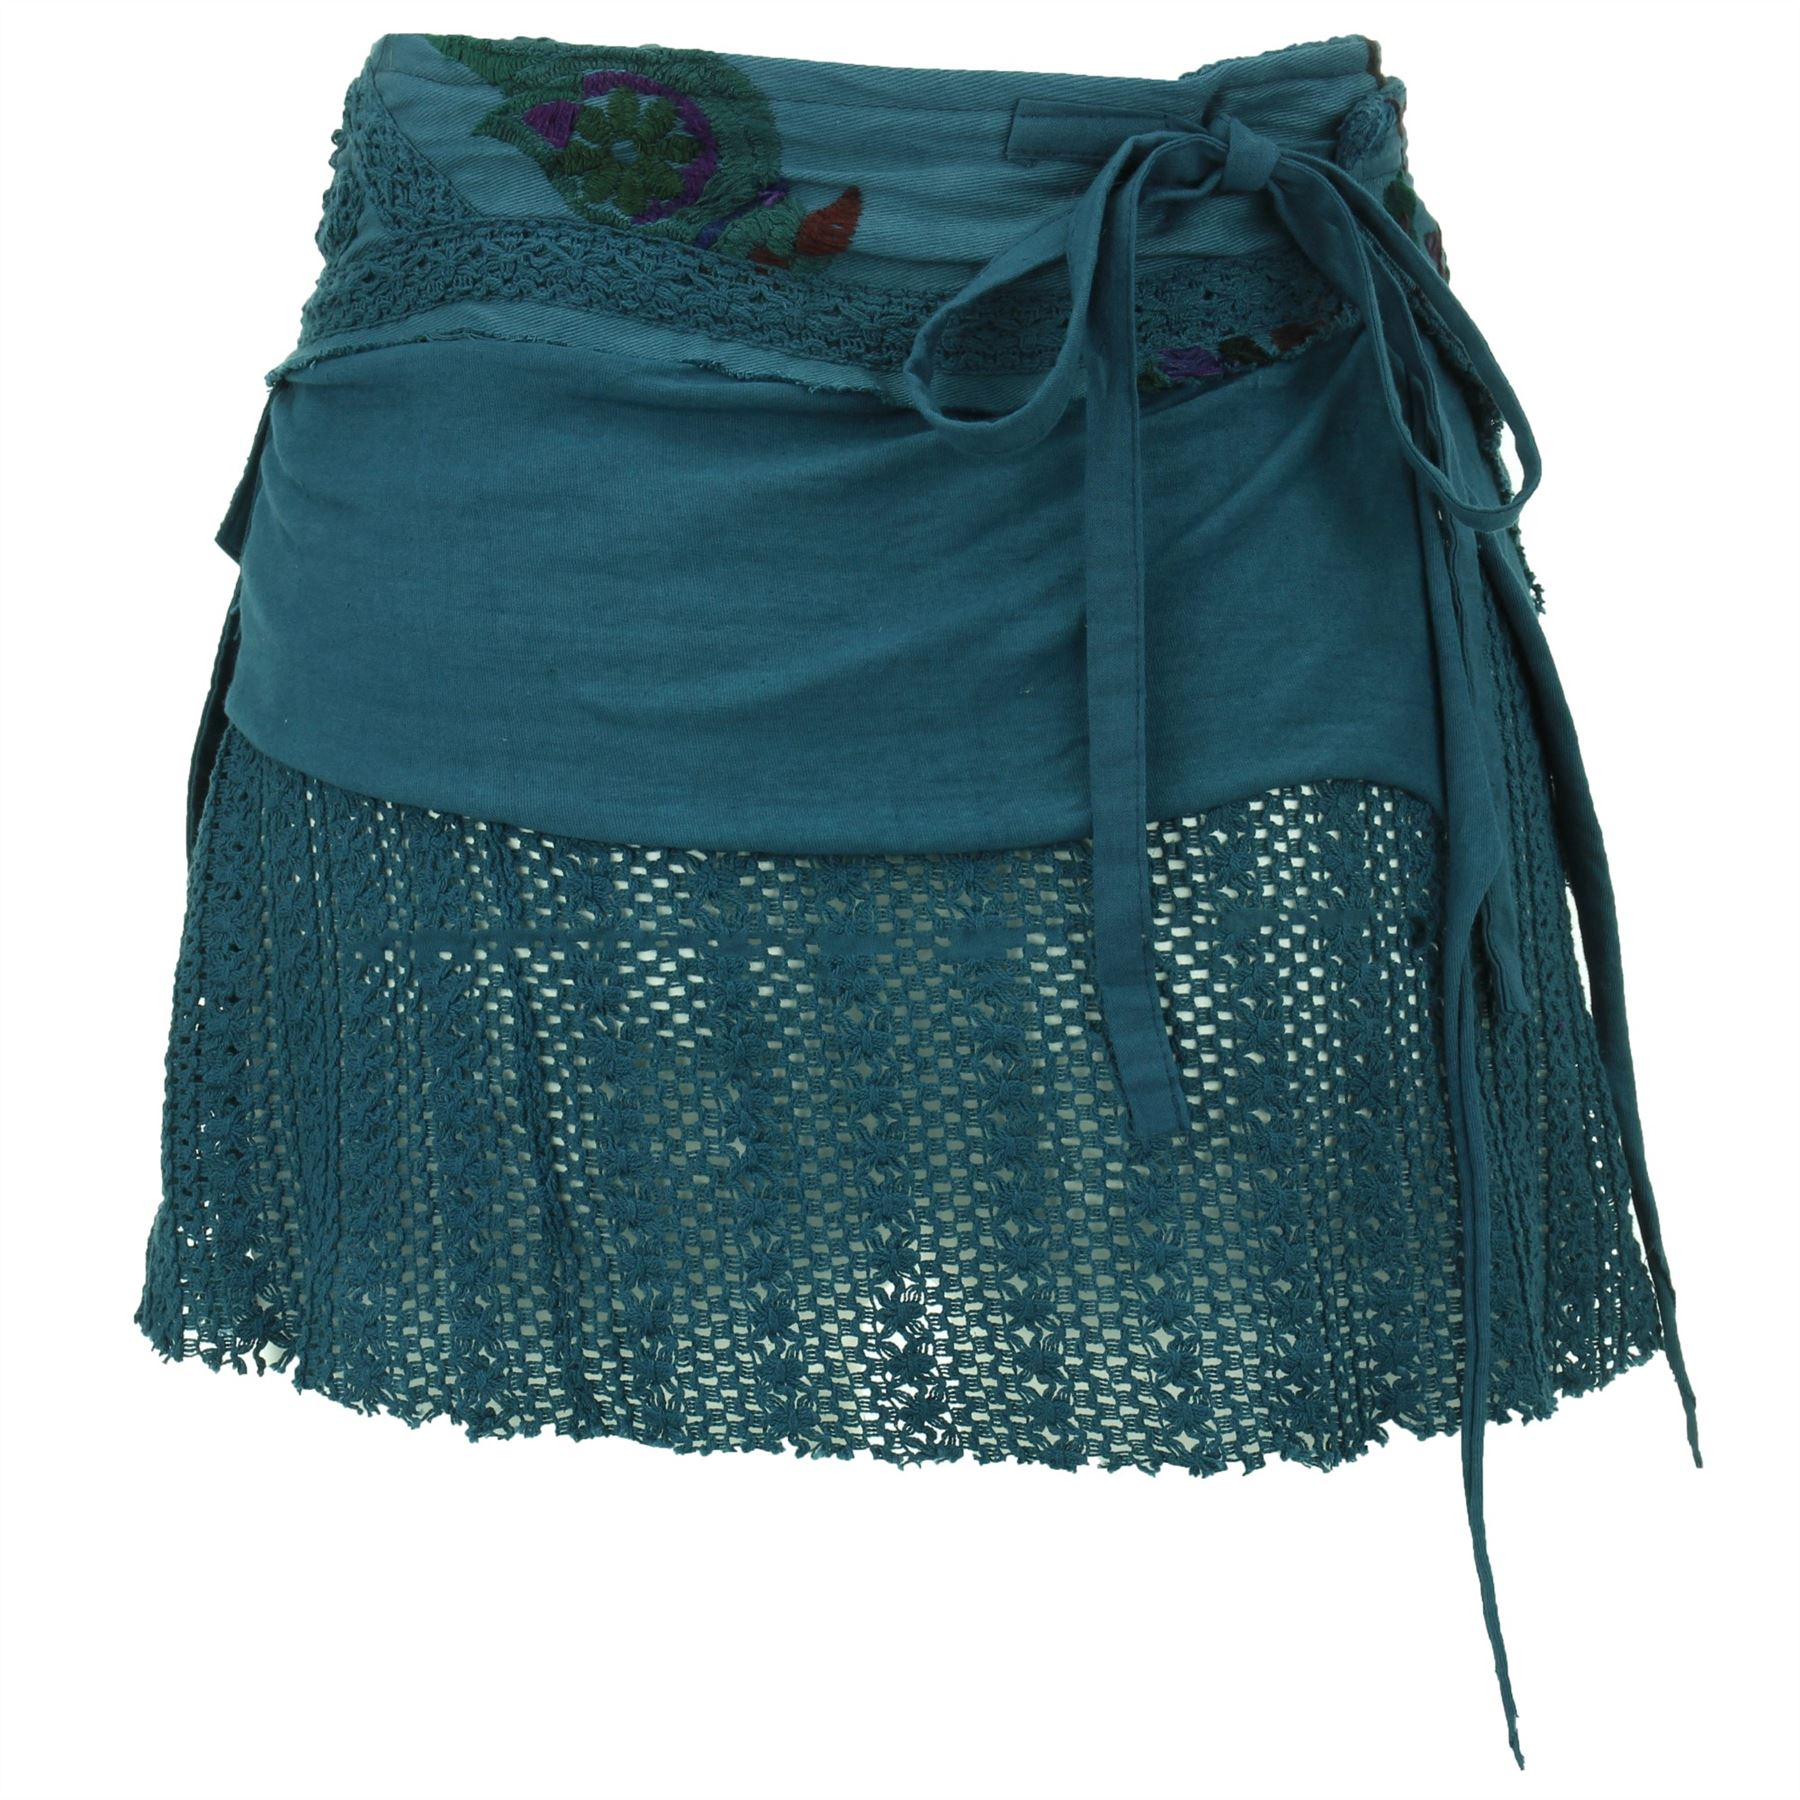 Short Layered Wrap Skirt Gringo Boho Hippie Bohemian Hook Loop Women